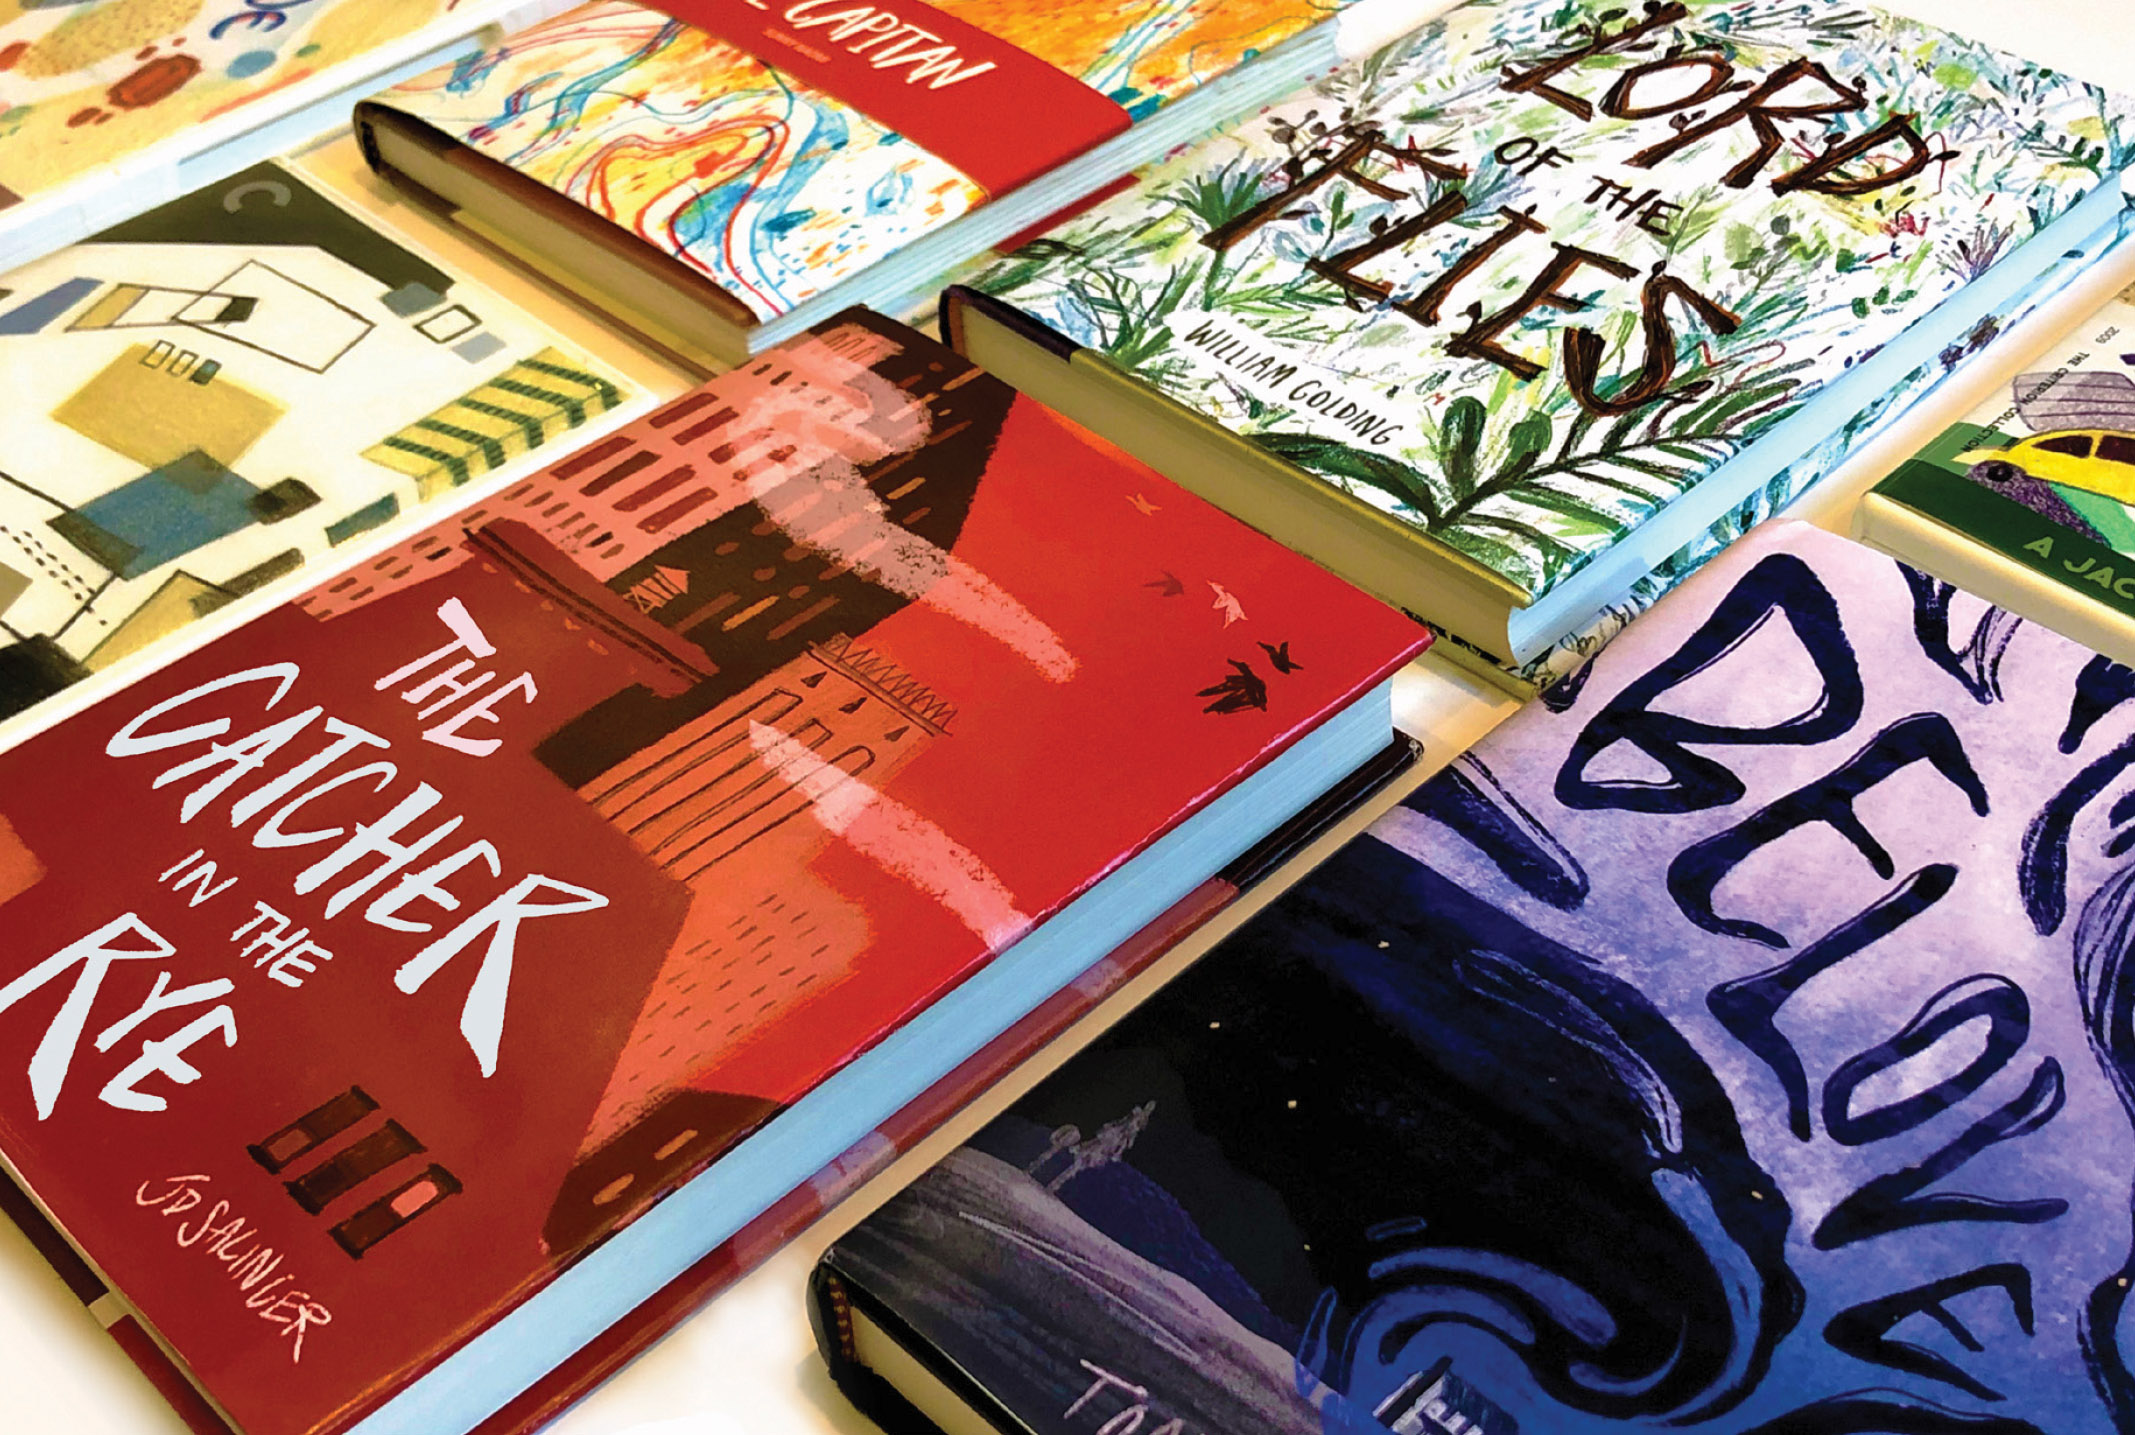 banned books set